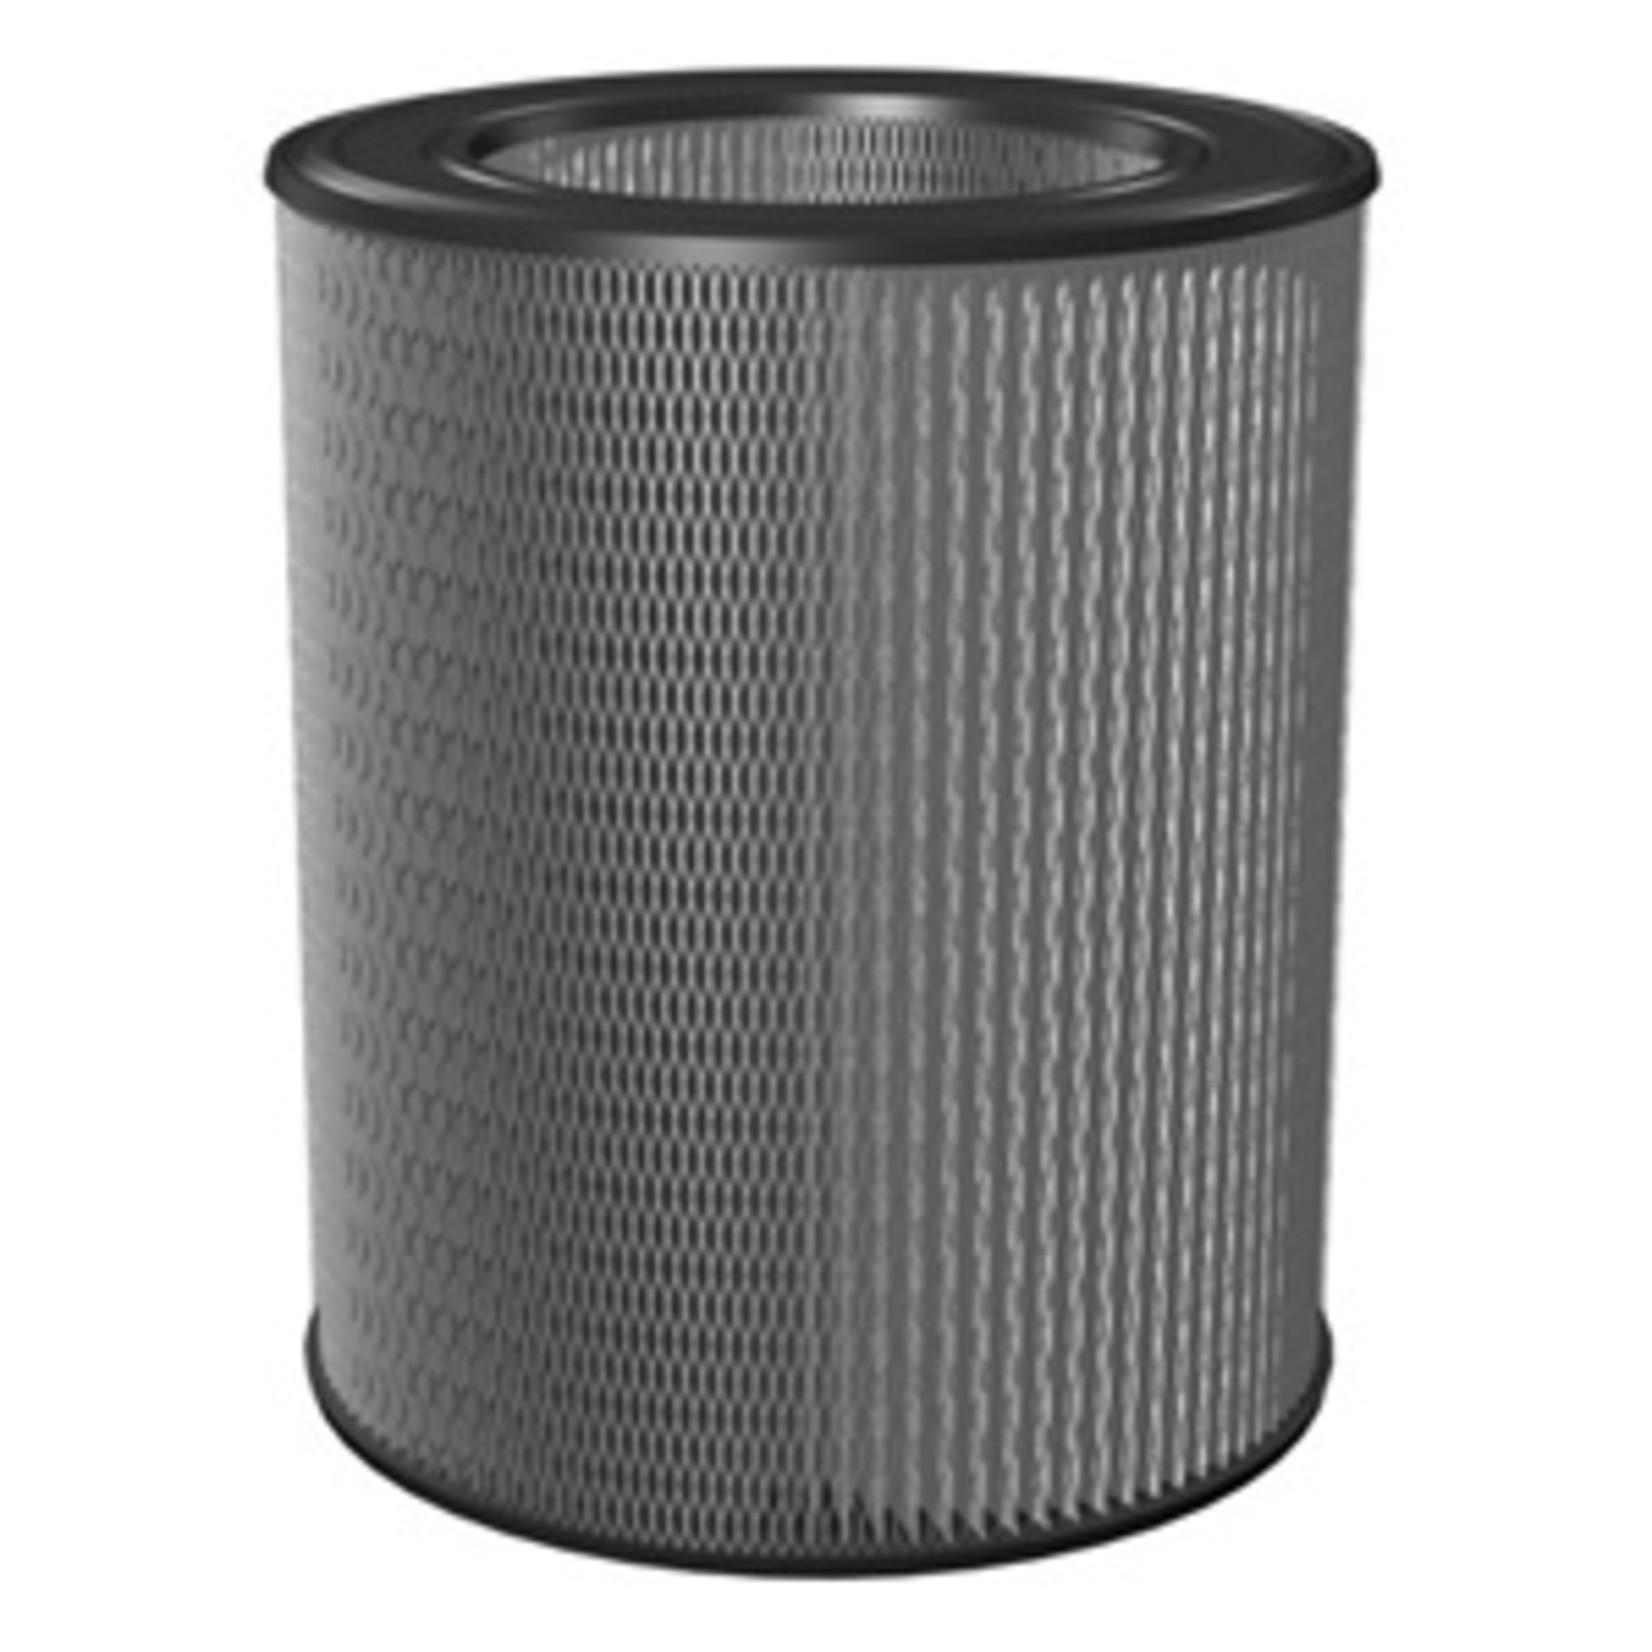 Amaircare Amaircare 16″ Molded HEPA Filter Cartridge